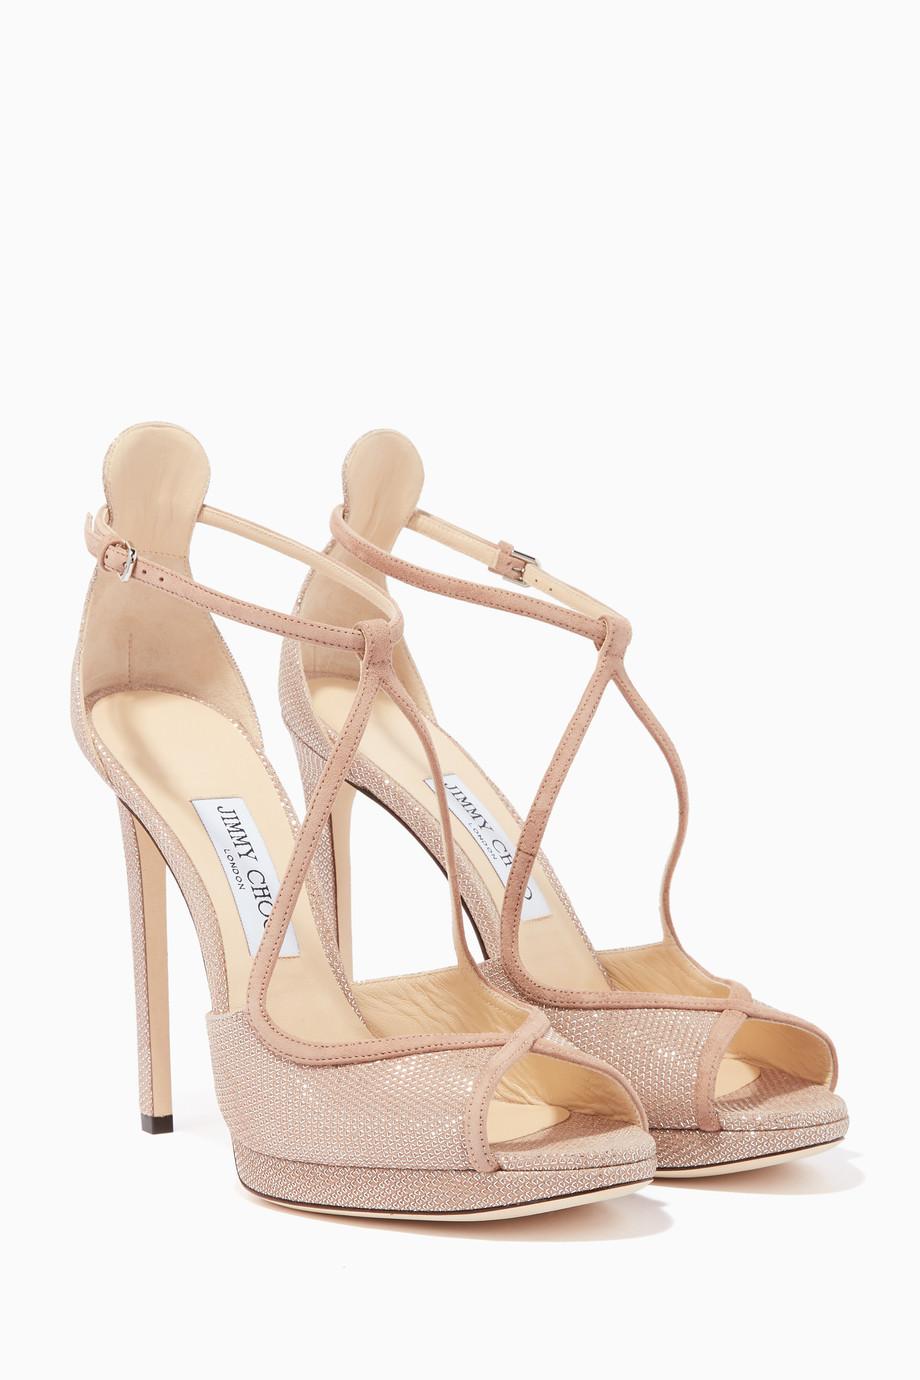 71e57dbe6407 Shop Jimmy Choo Pink Ballet-Pink Suede   Glitter Fawne 120 Sandals ...